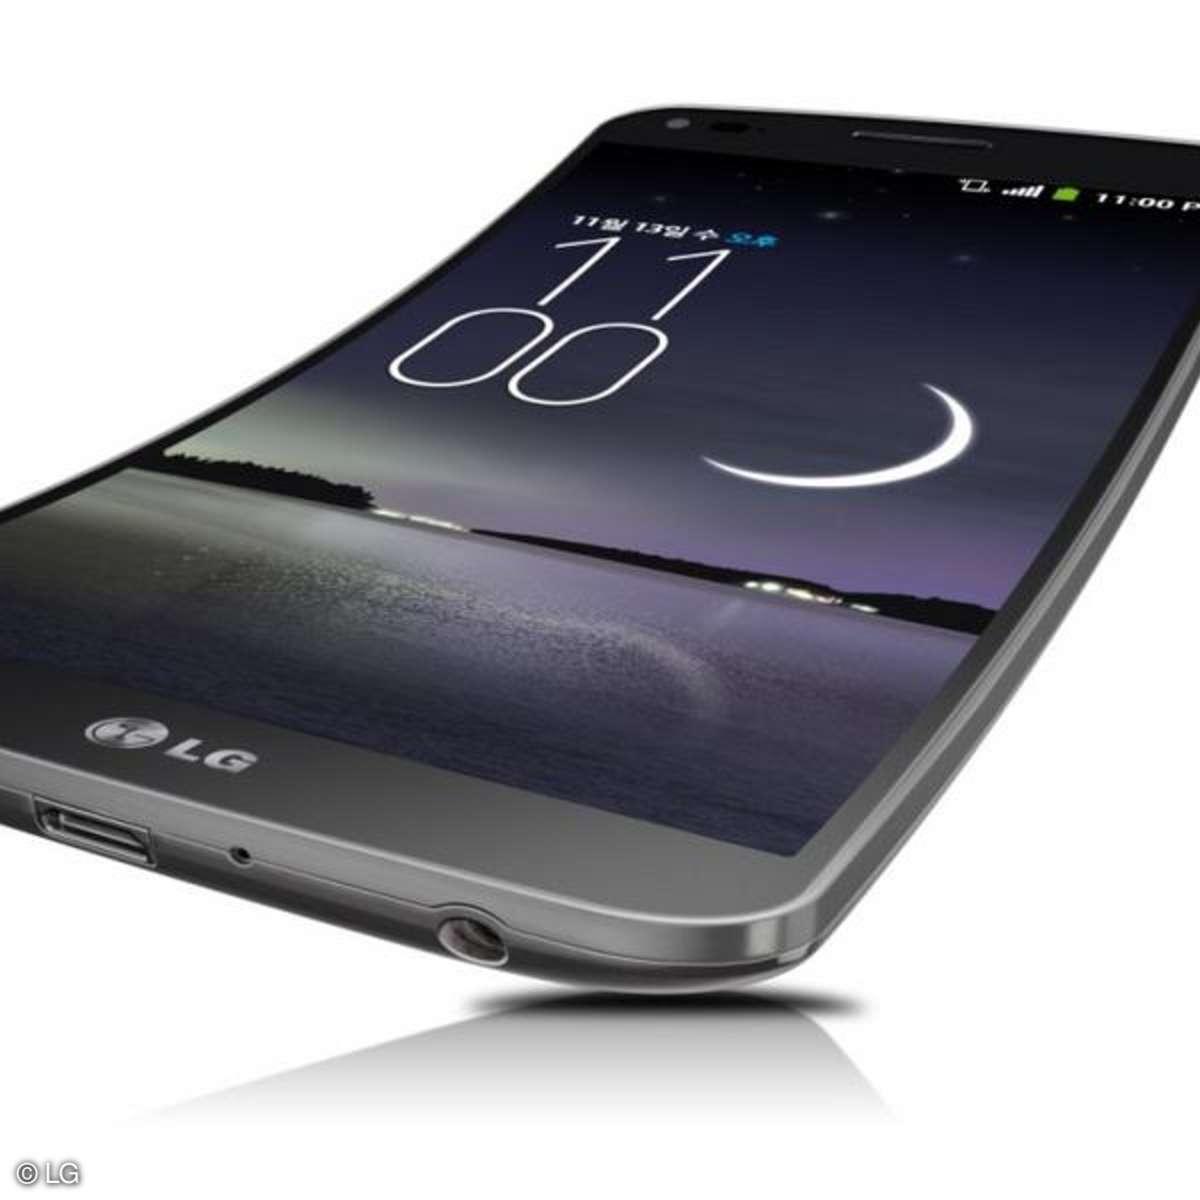 LG G Flex,  Curved-Display, Smartphone, LG